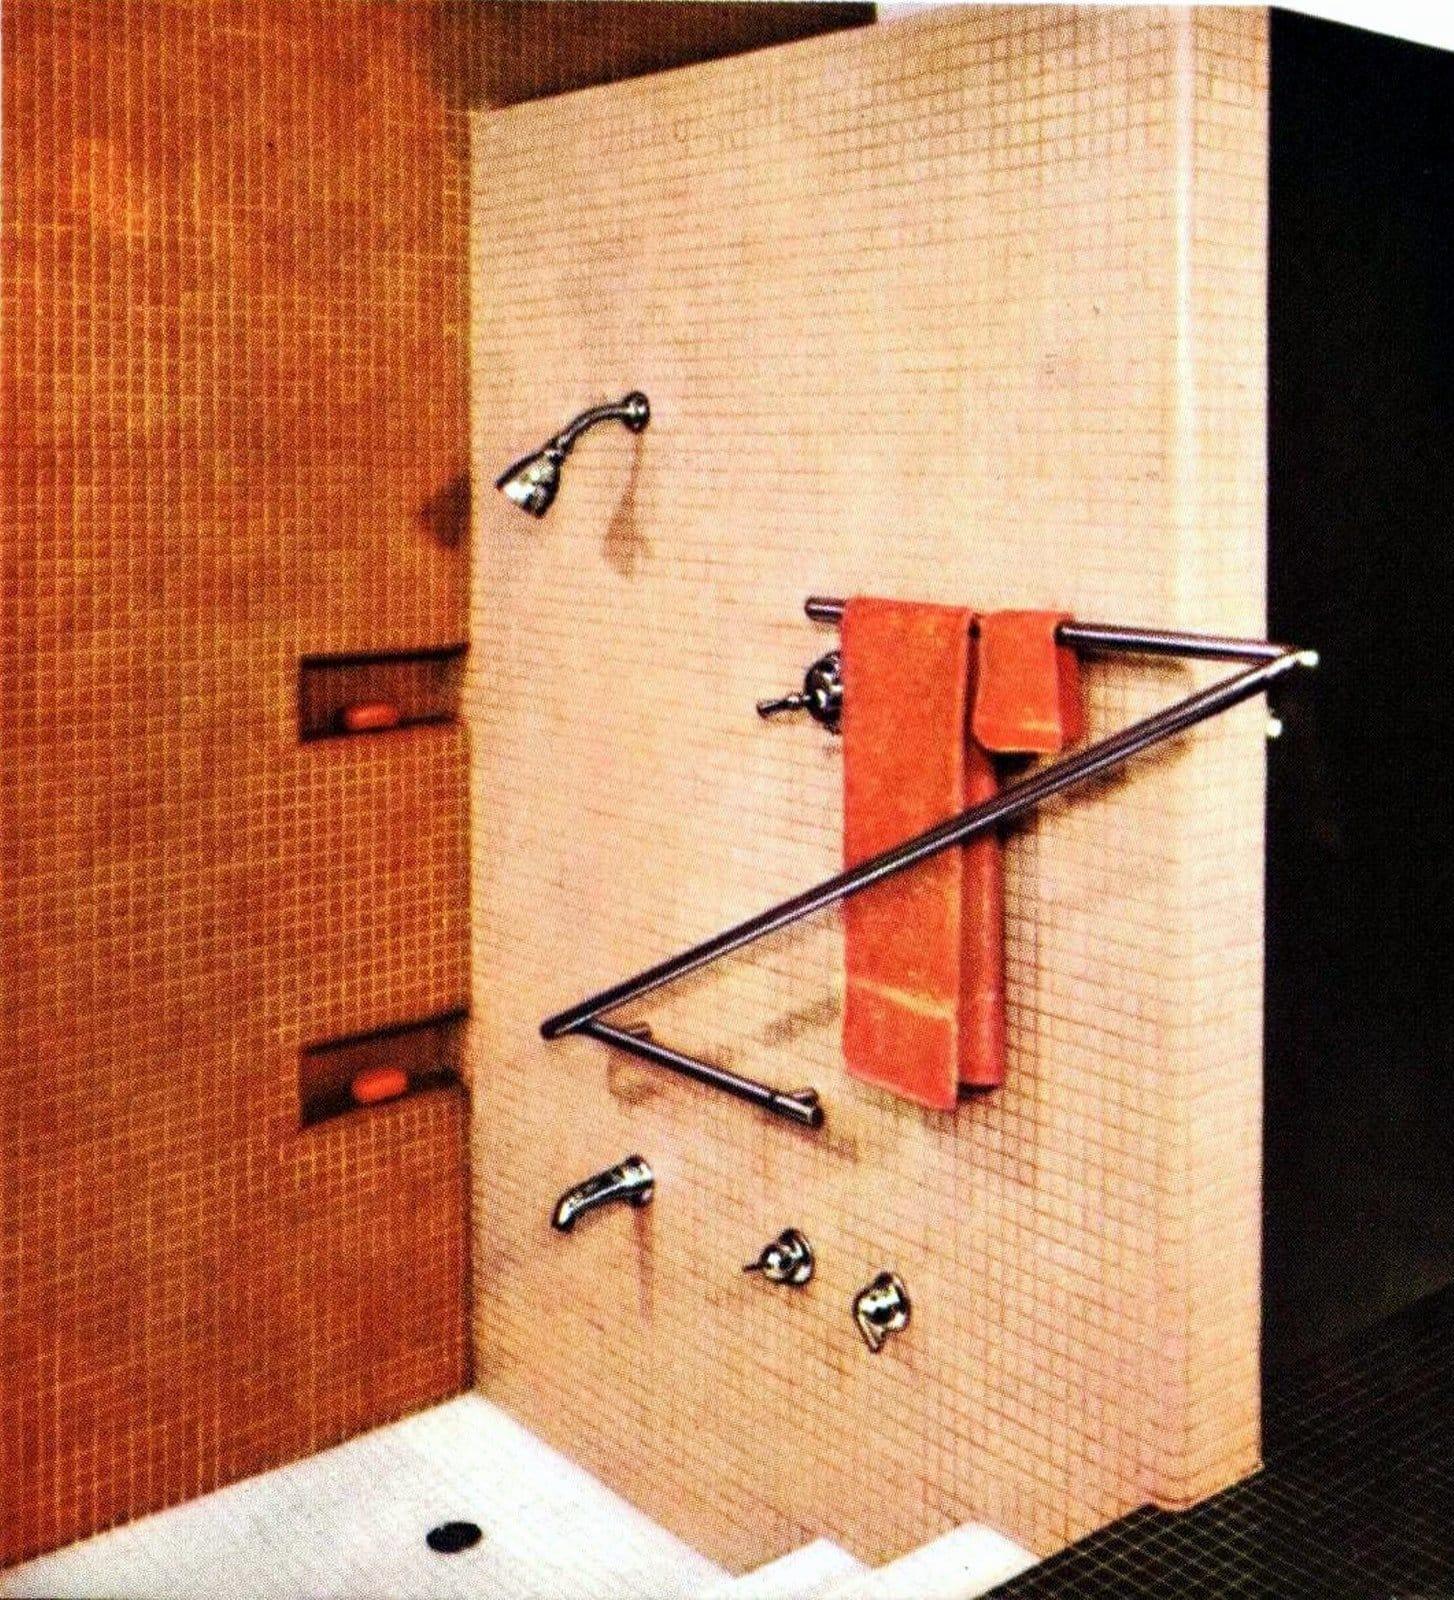 Salmon-colored mosaic vintage bathroom tile walk-in shower